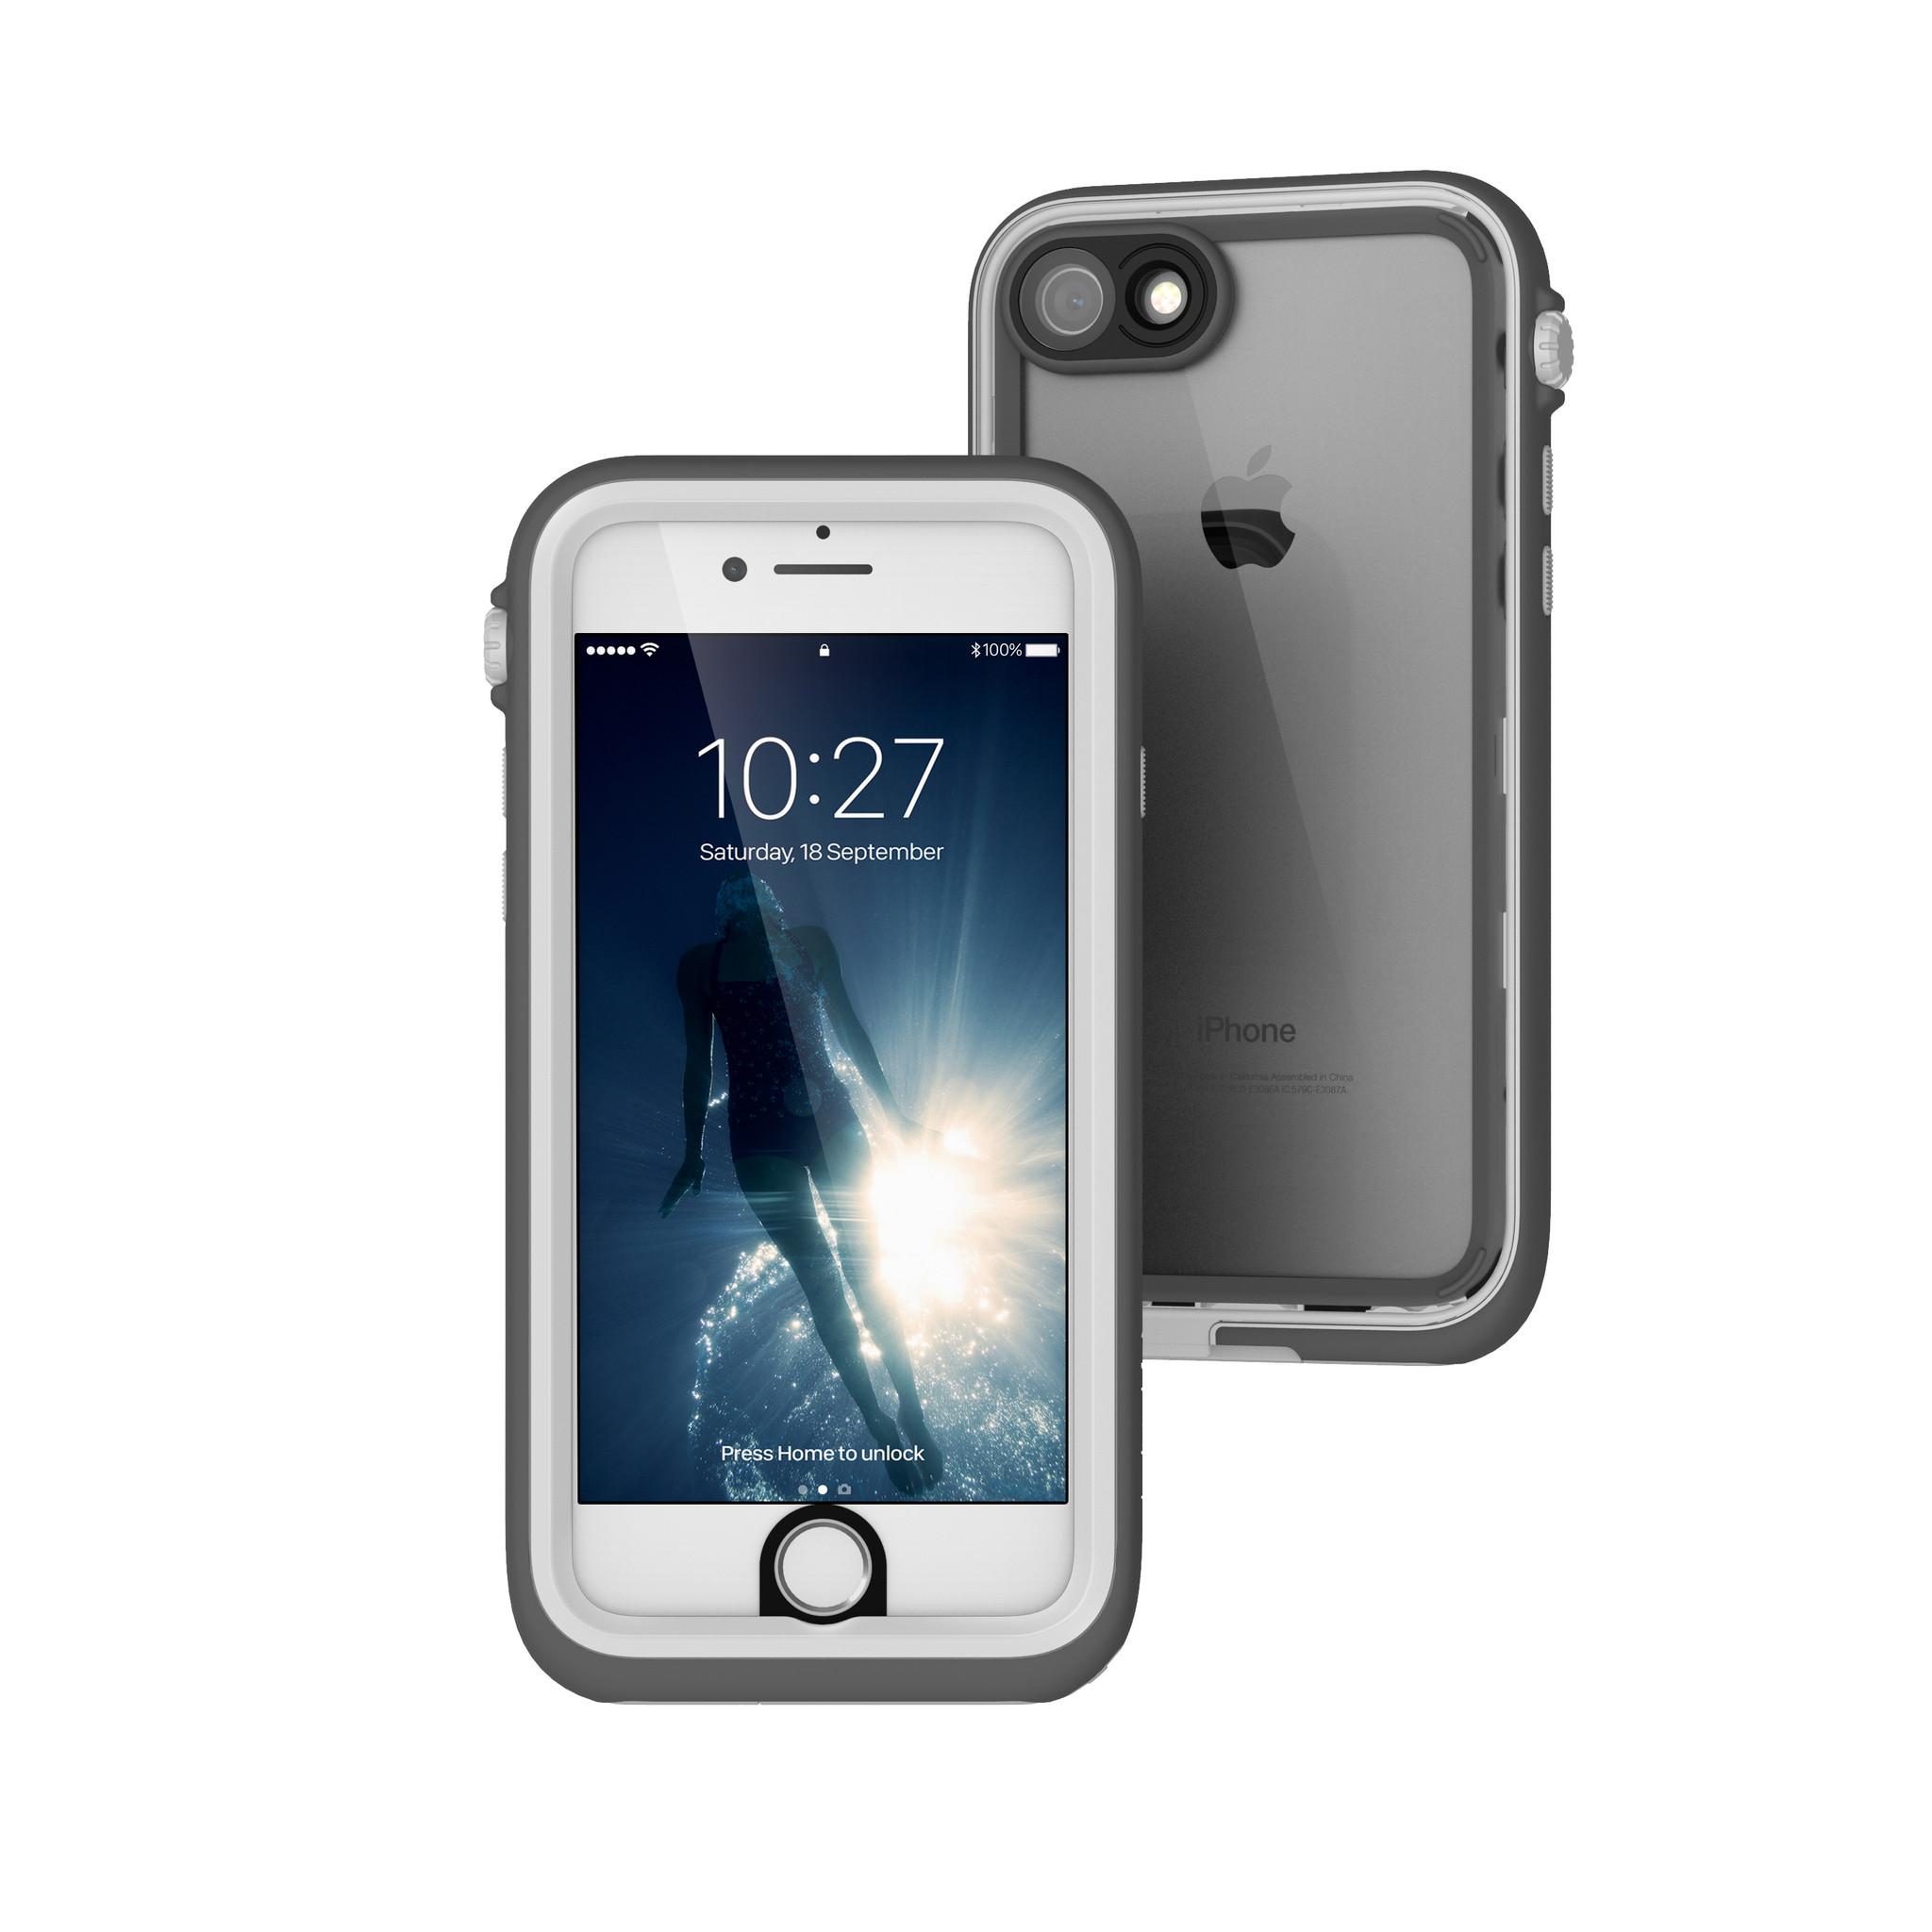 Voděodolné pouzdro / kryt pro Apple iPhone 7 - Catalyst, Waterproof Case White